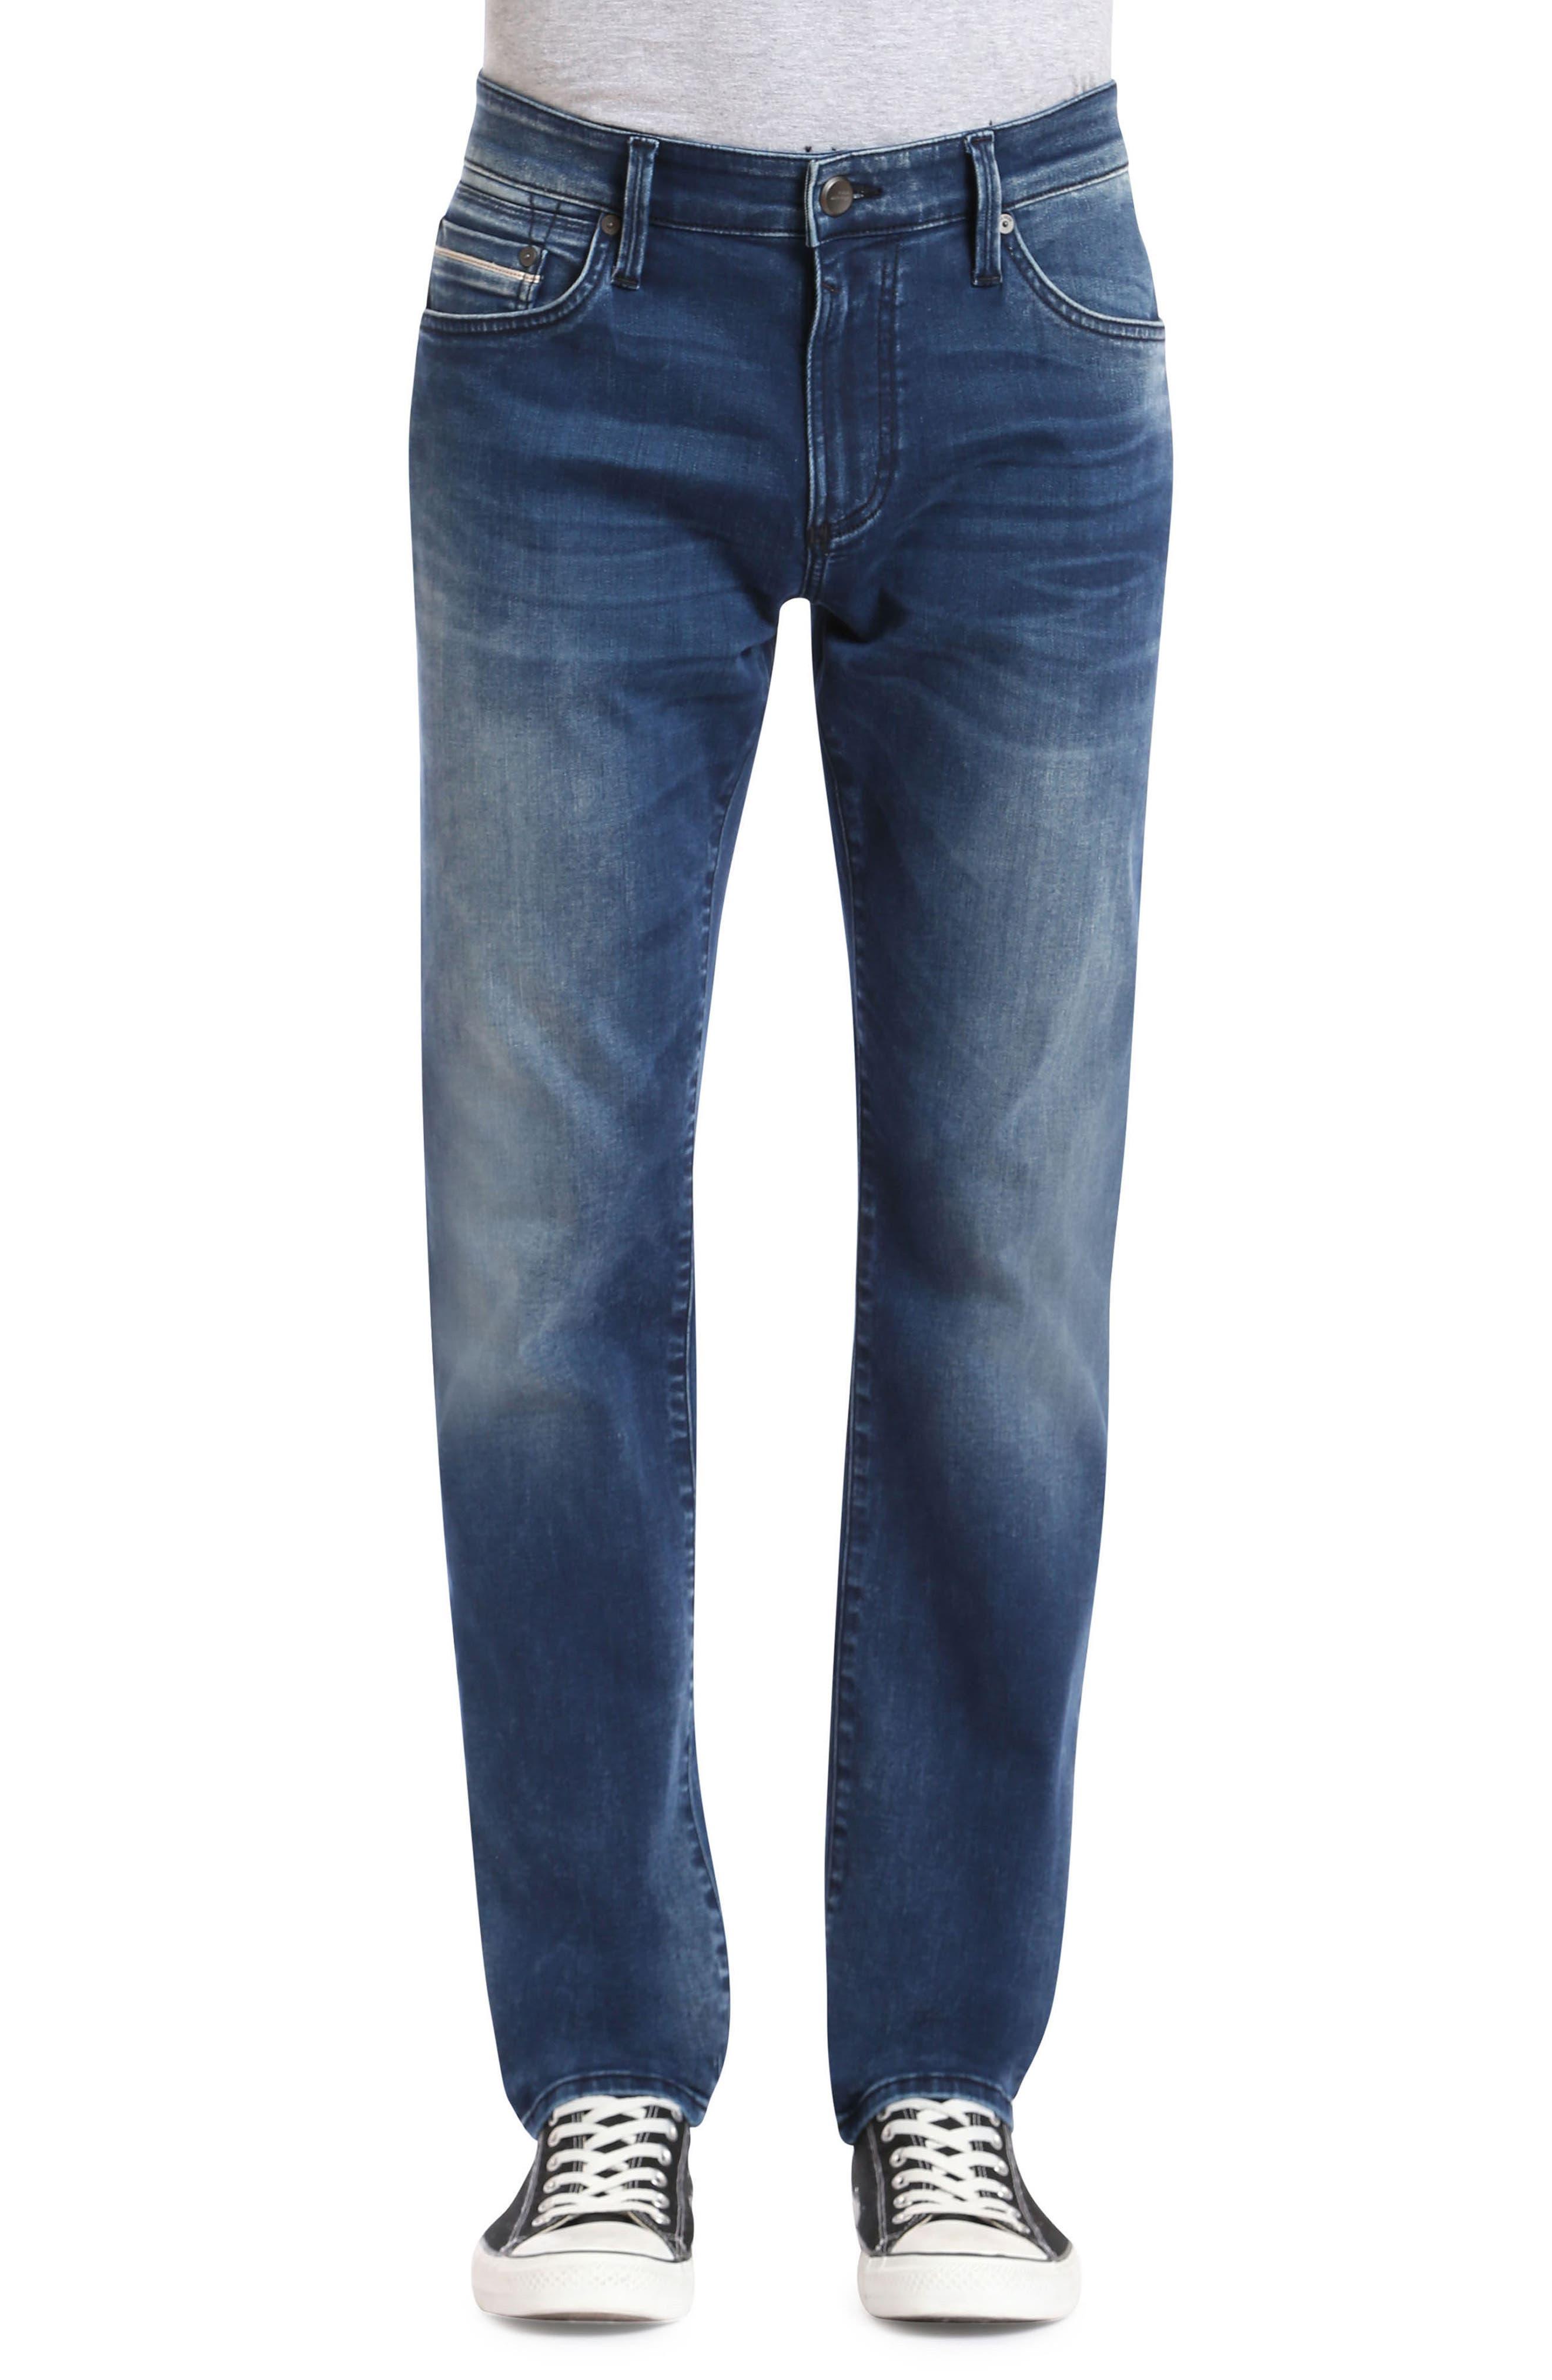 Marcus Slim Straight Leg Jeans,                         Main,                         color, Forest Blue White Edge